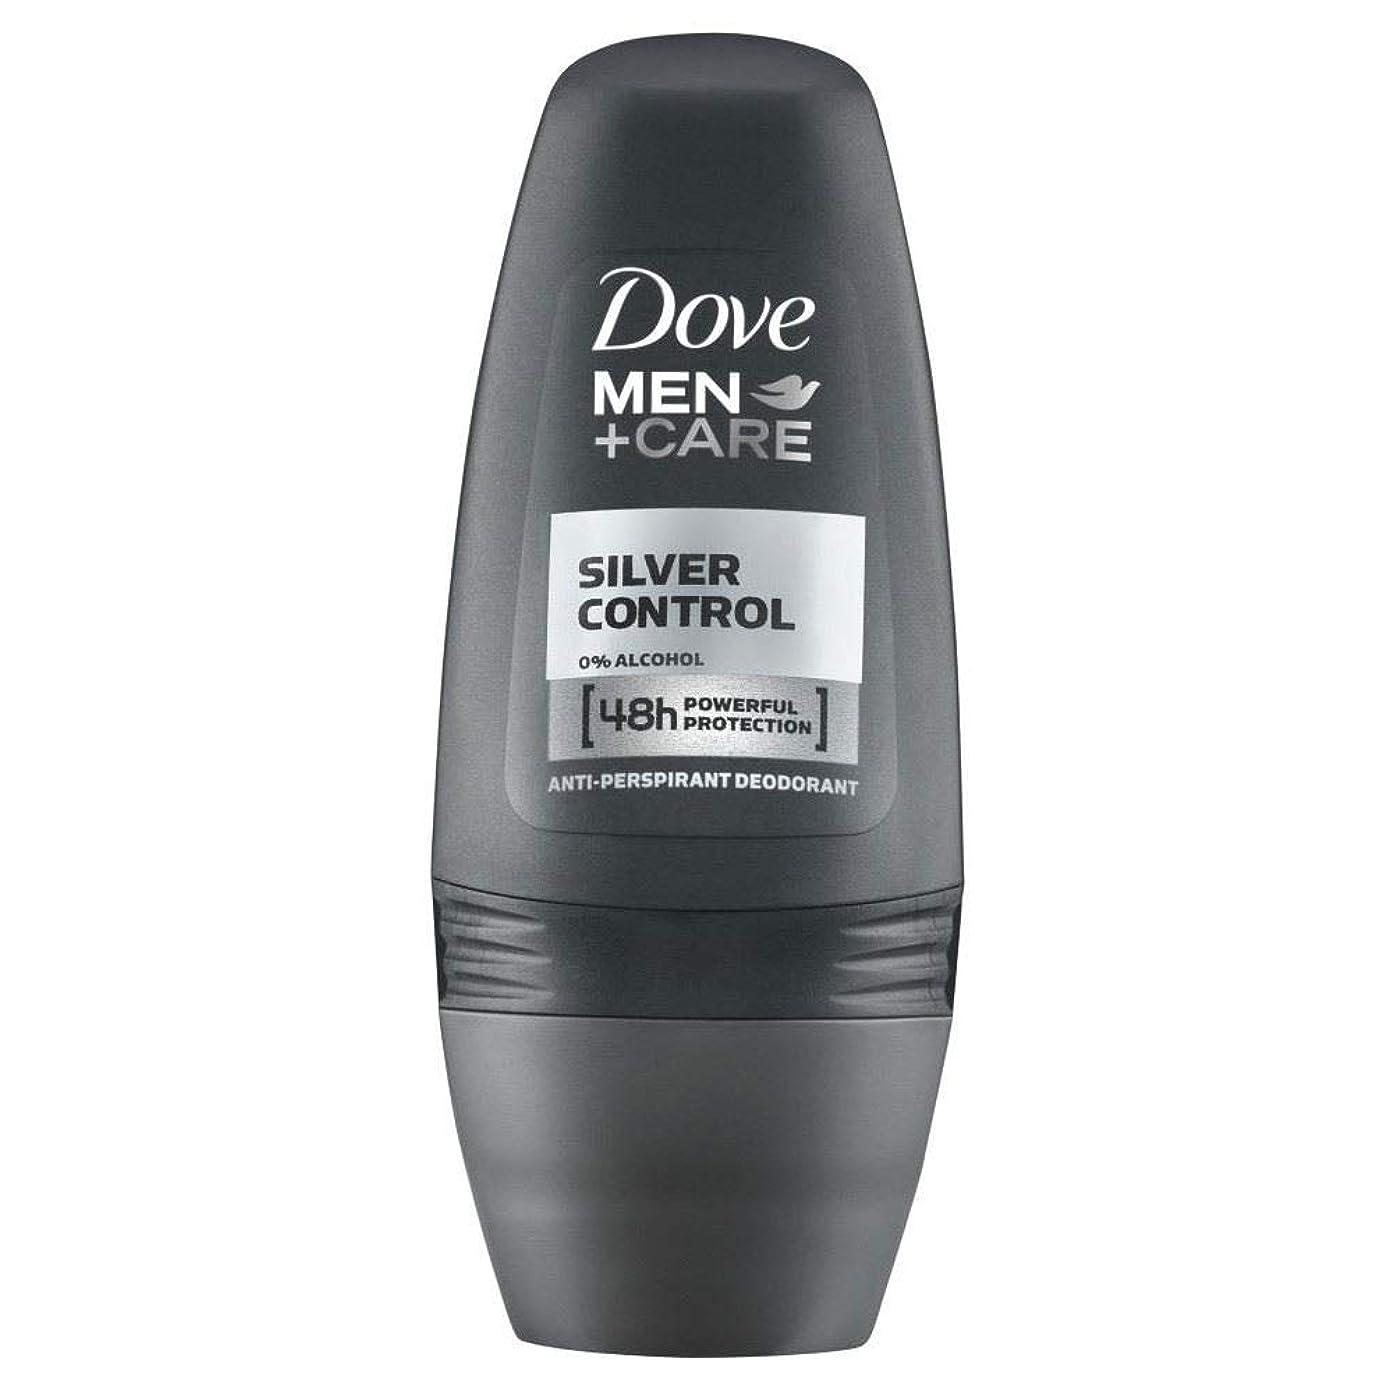 [Dove ] 消臭にロール銀制御抗制汗ケア+鳩の男性(50ミリリットル) - Dove Men + Care Silver Control Anti Perspirant Roll-on Deodorant (50ml) [並行輸入品]